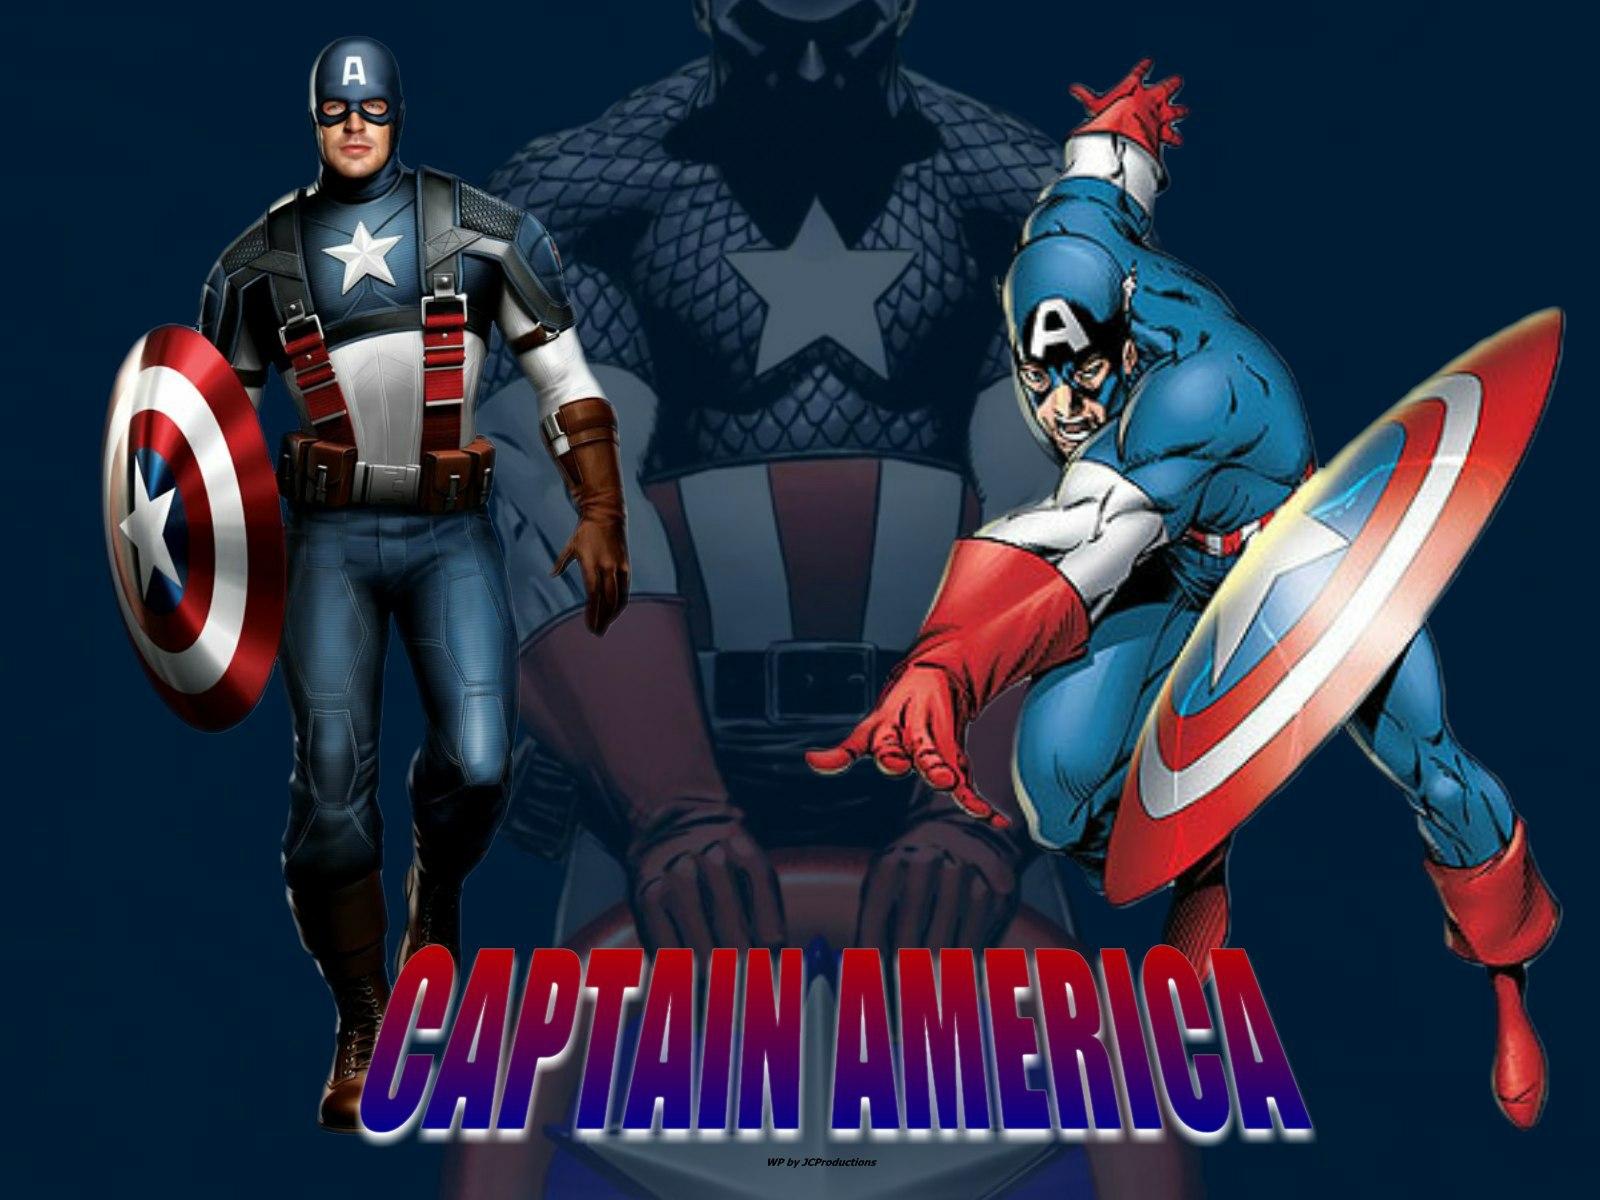 Captain america captain america wallpaper 26883171 for Captain america